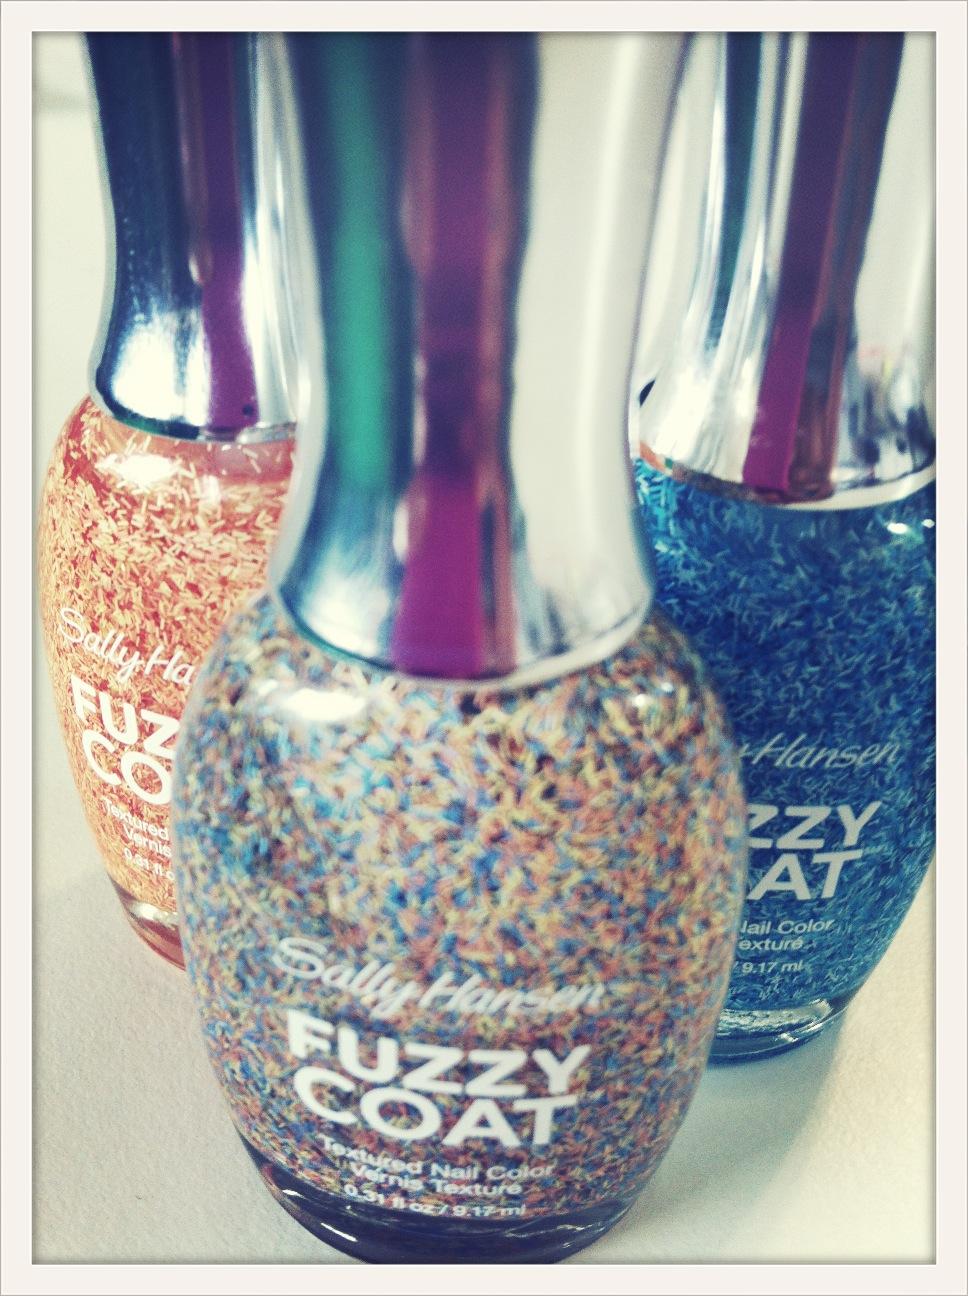 FuzzyCoat